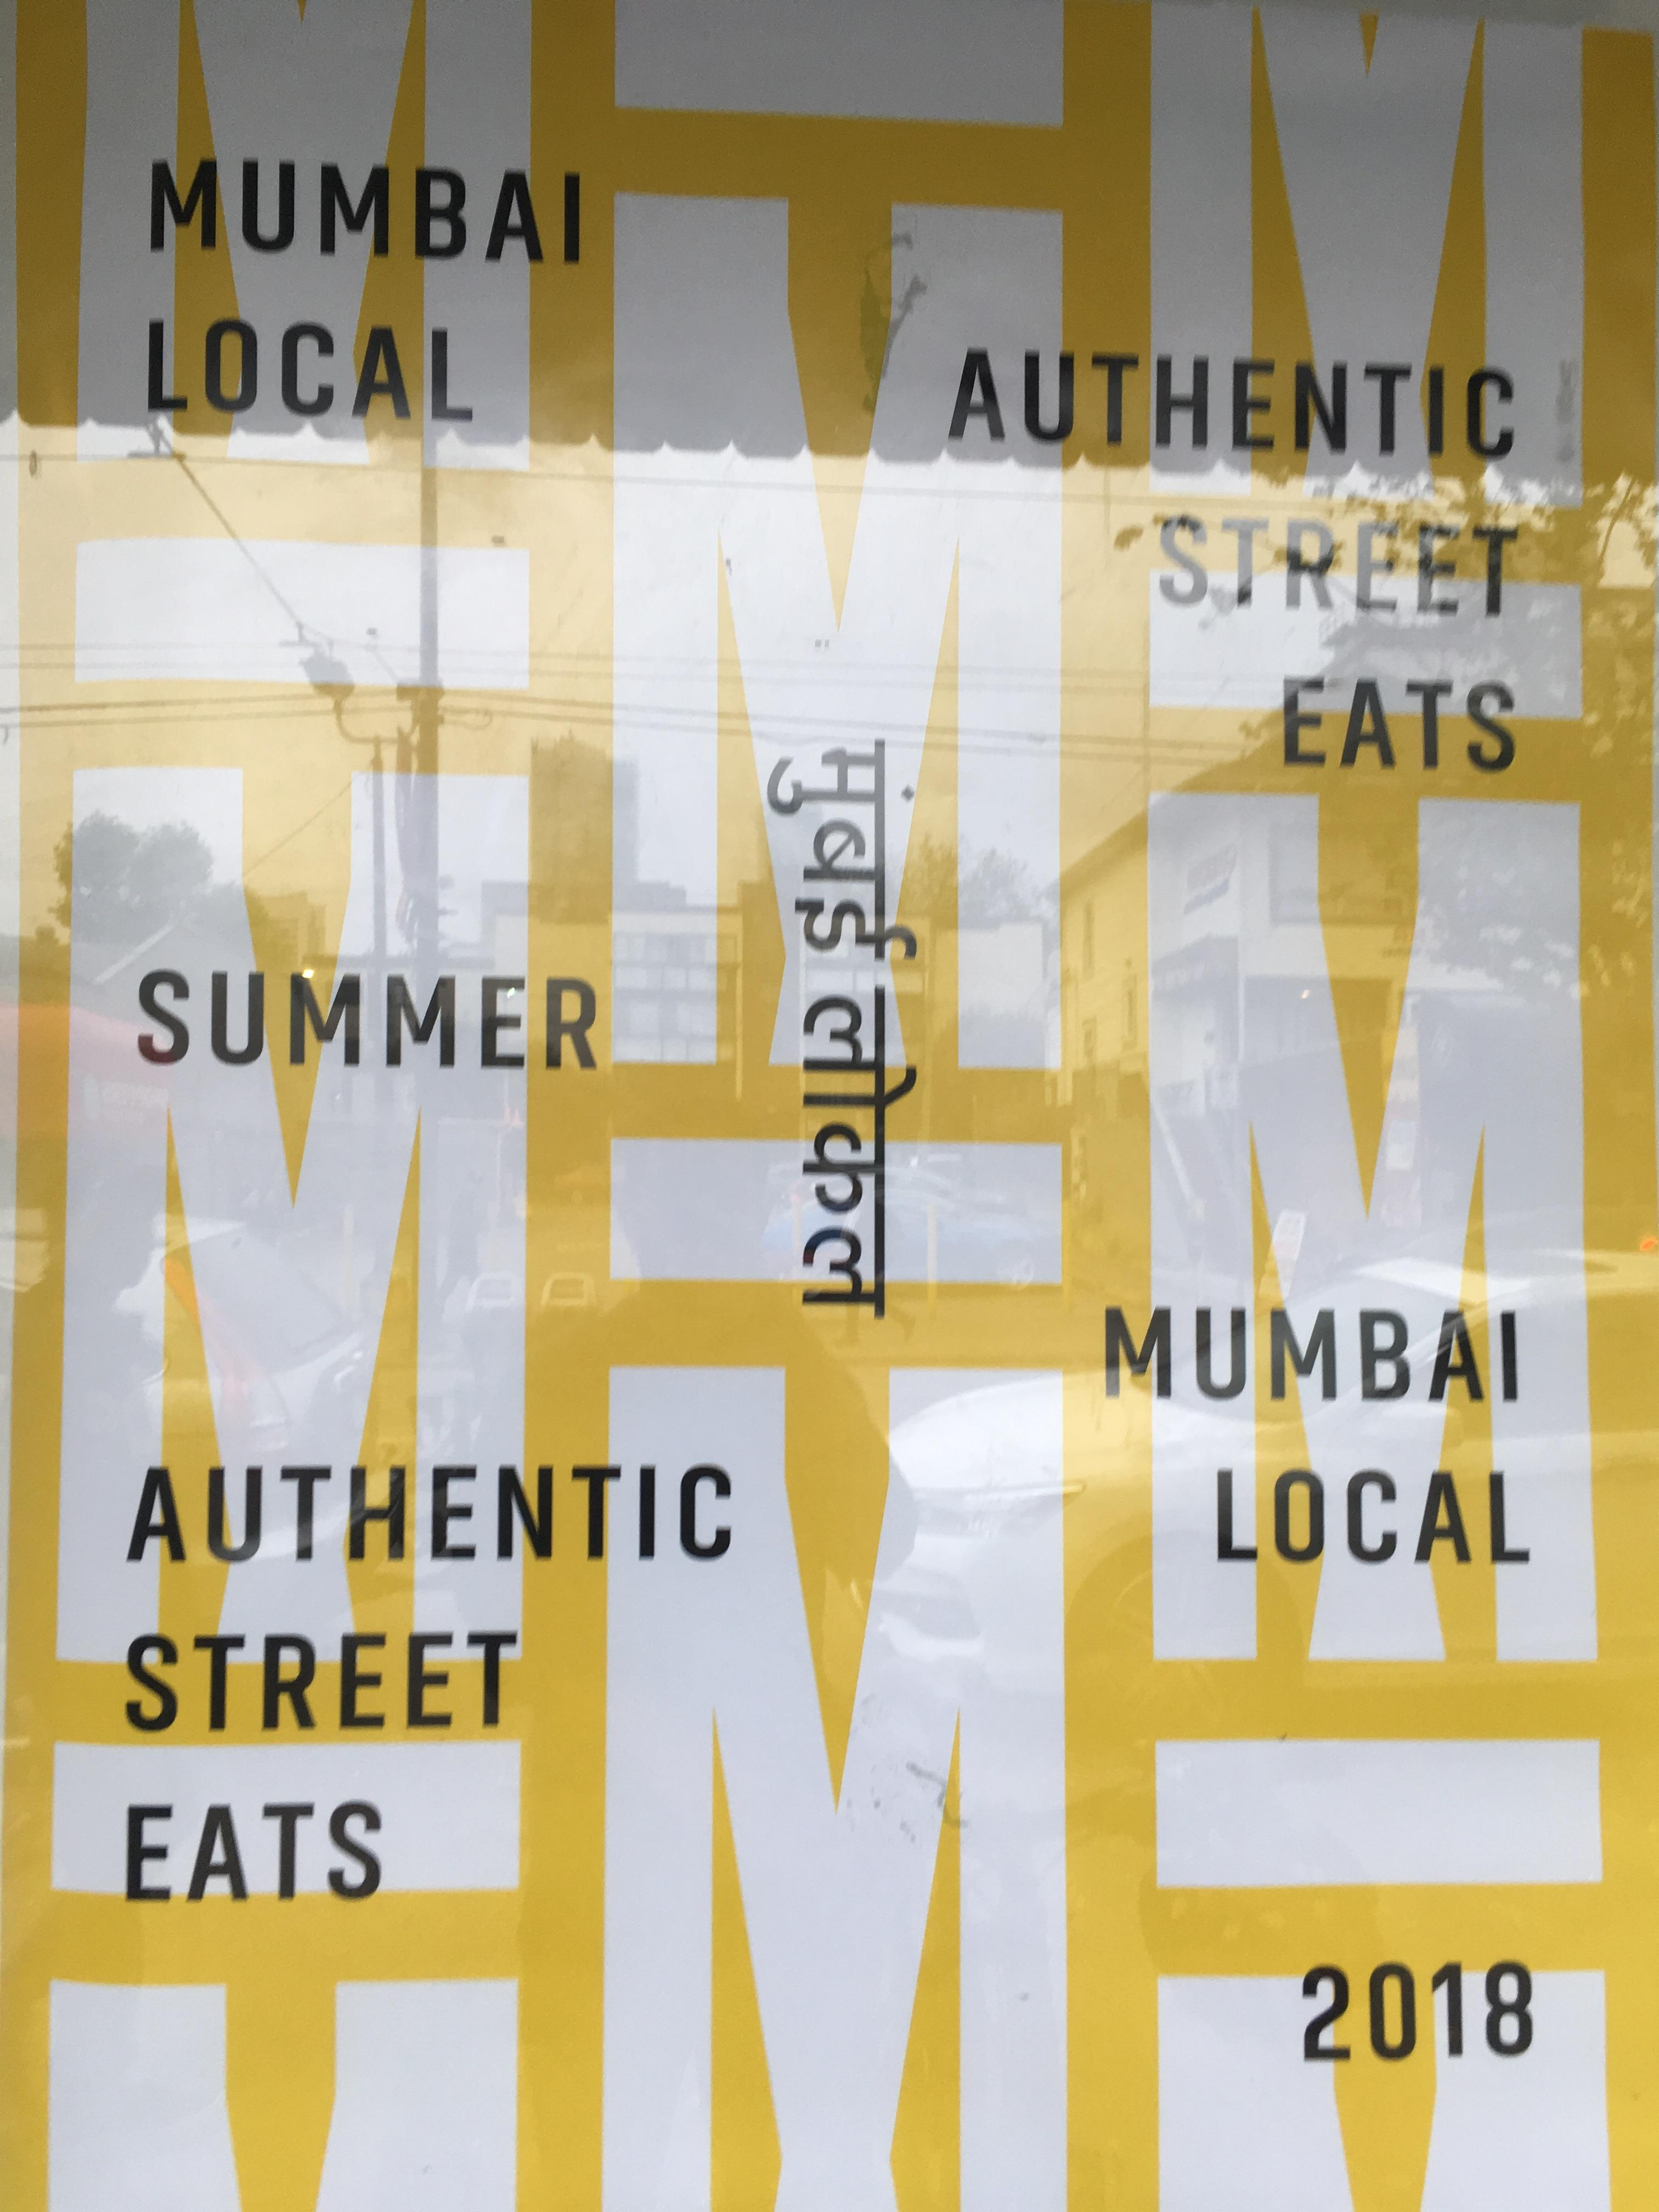 Mumbai Local opening